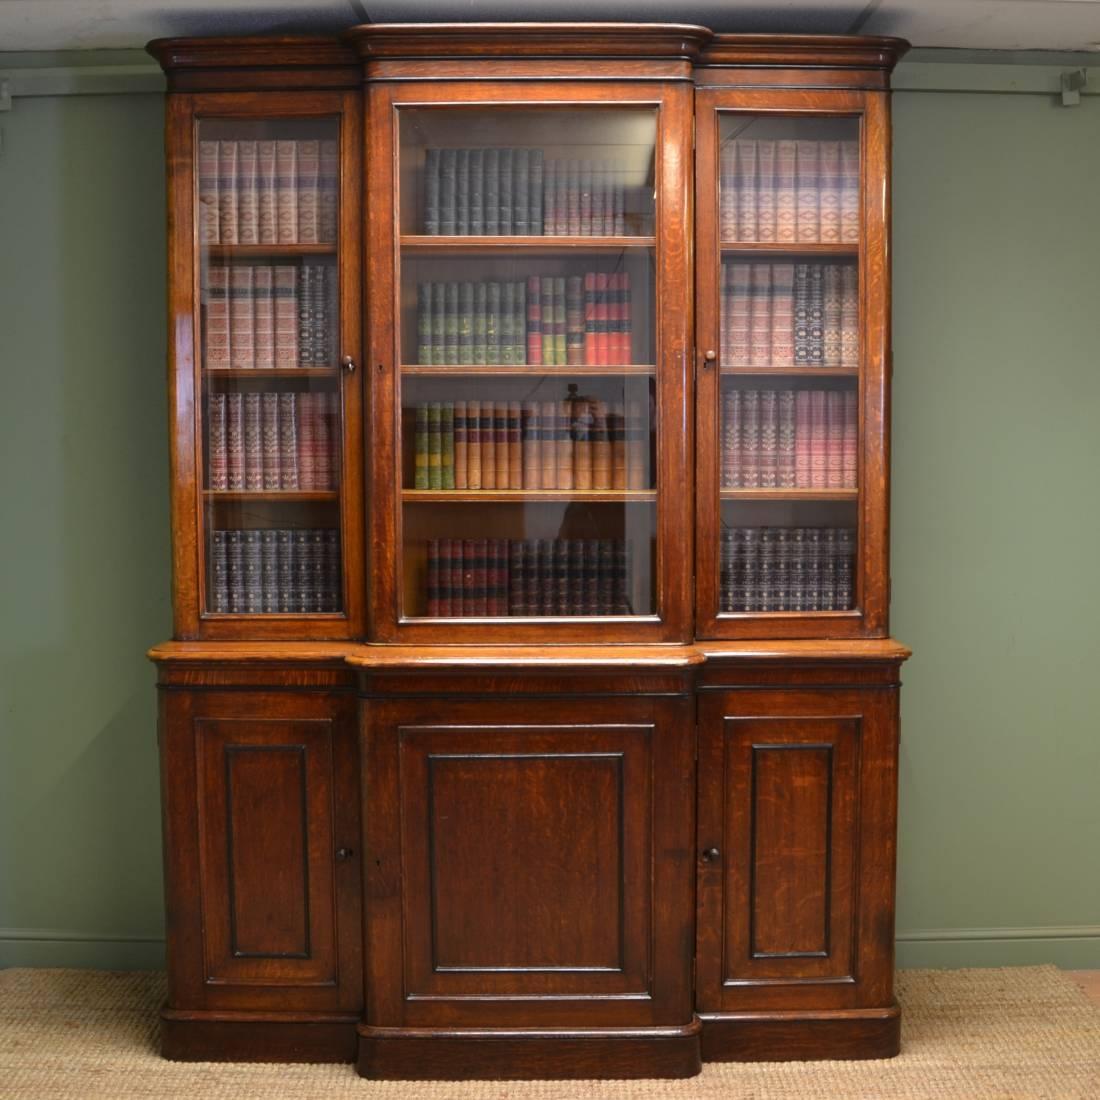 Popular Photo of Oak Library Bookcase